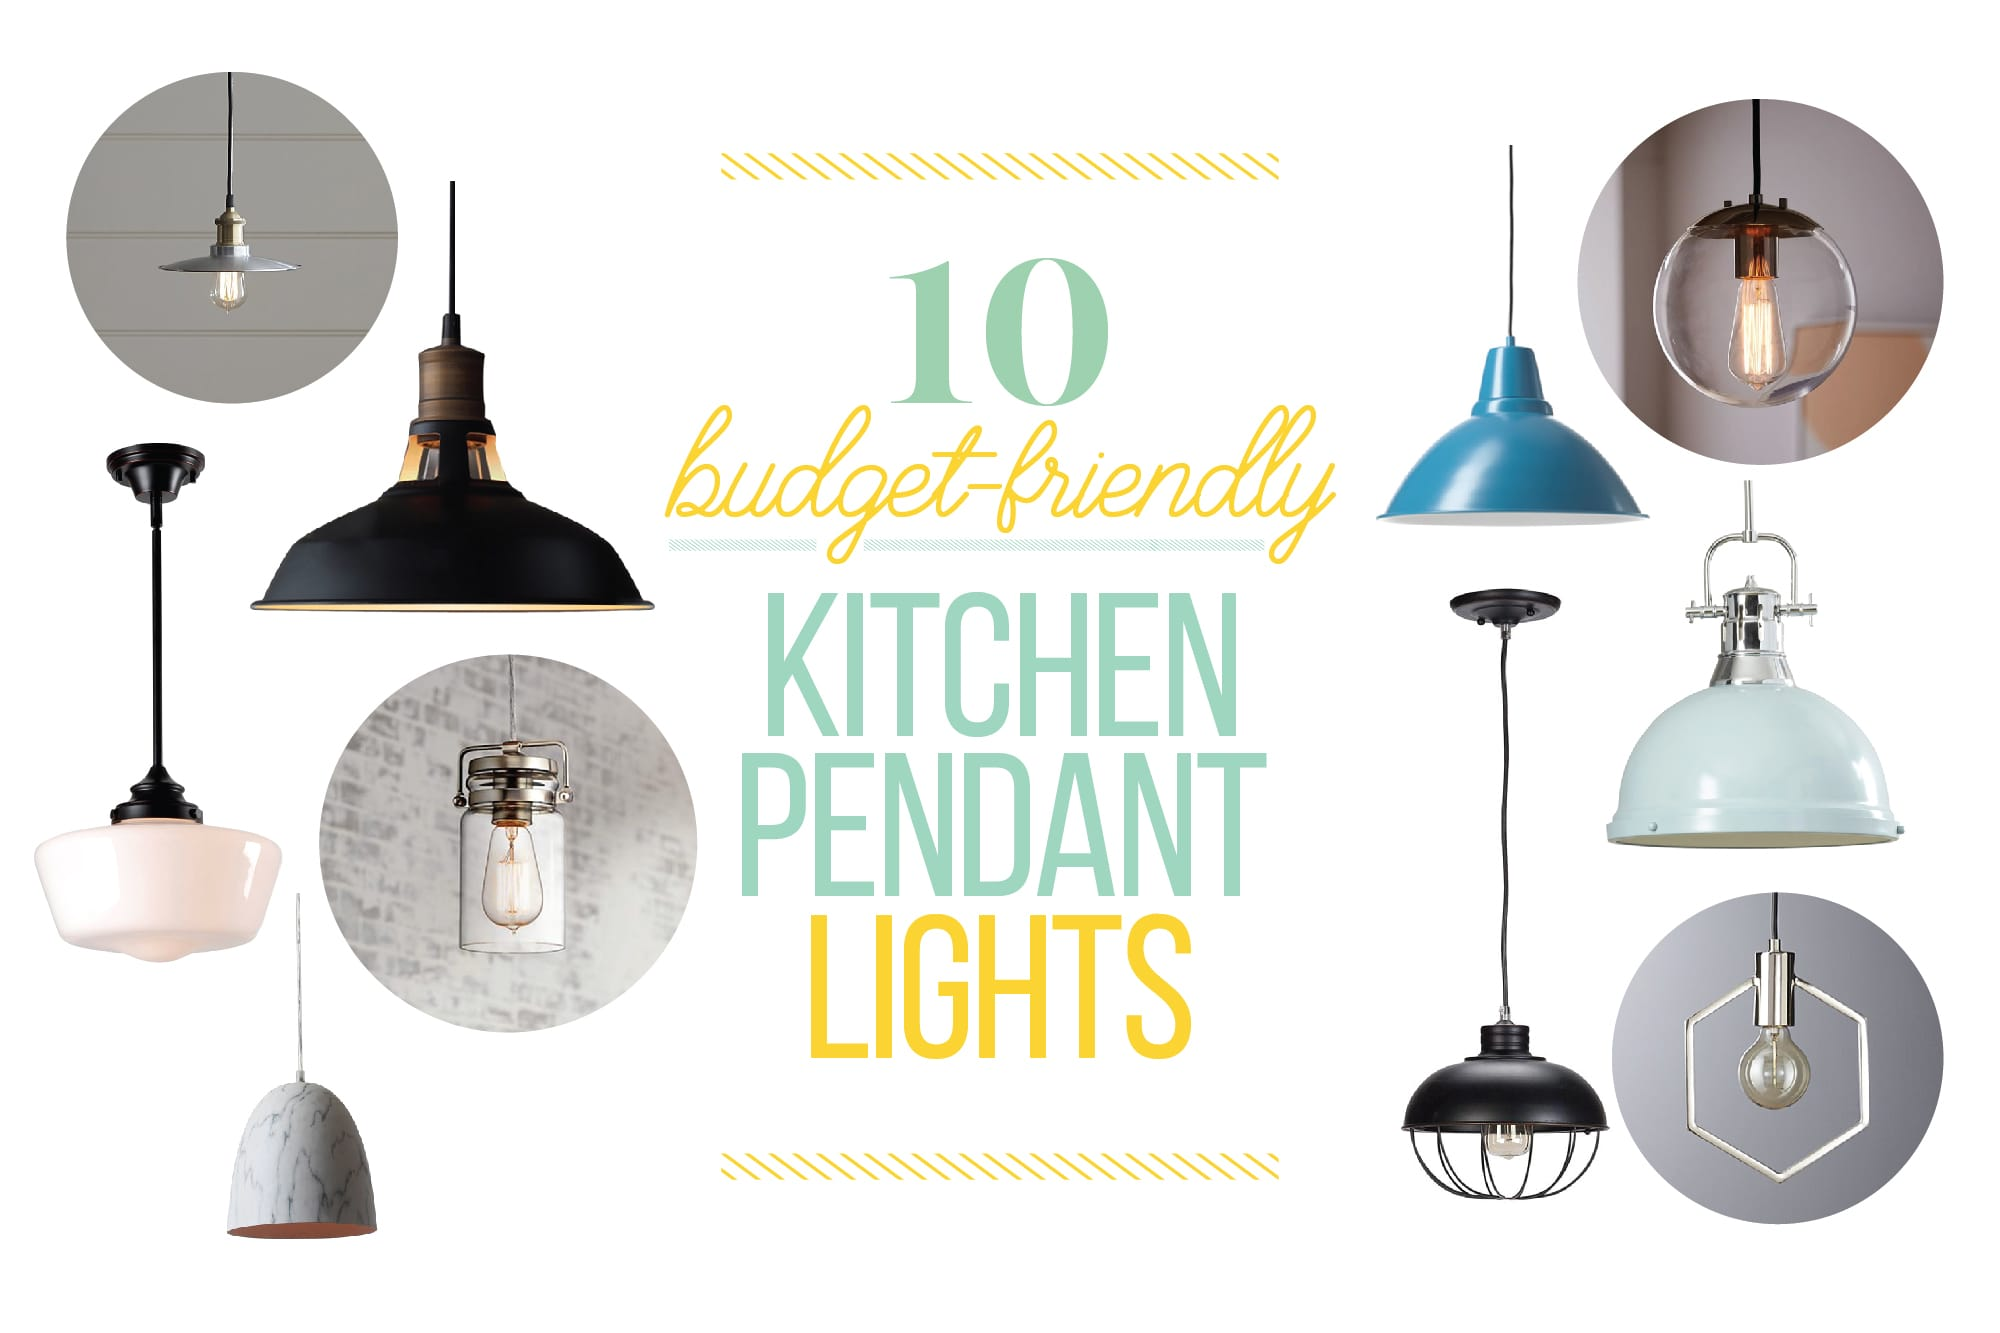 10 Budget-Friendly Kitchen Pendant Lights: gallery image 1